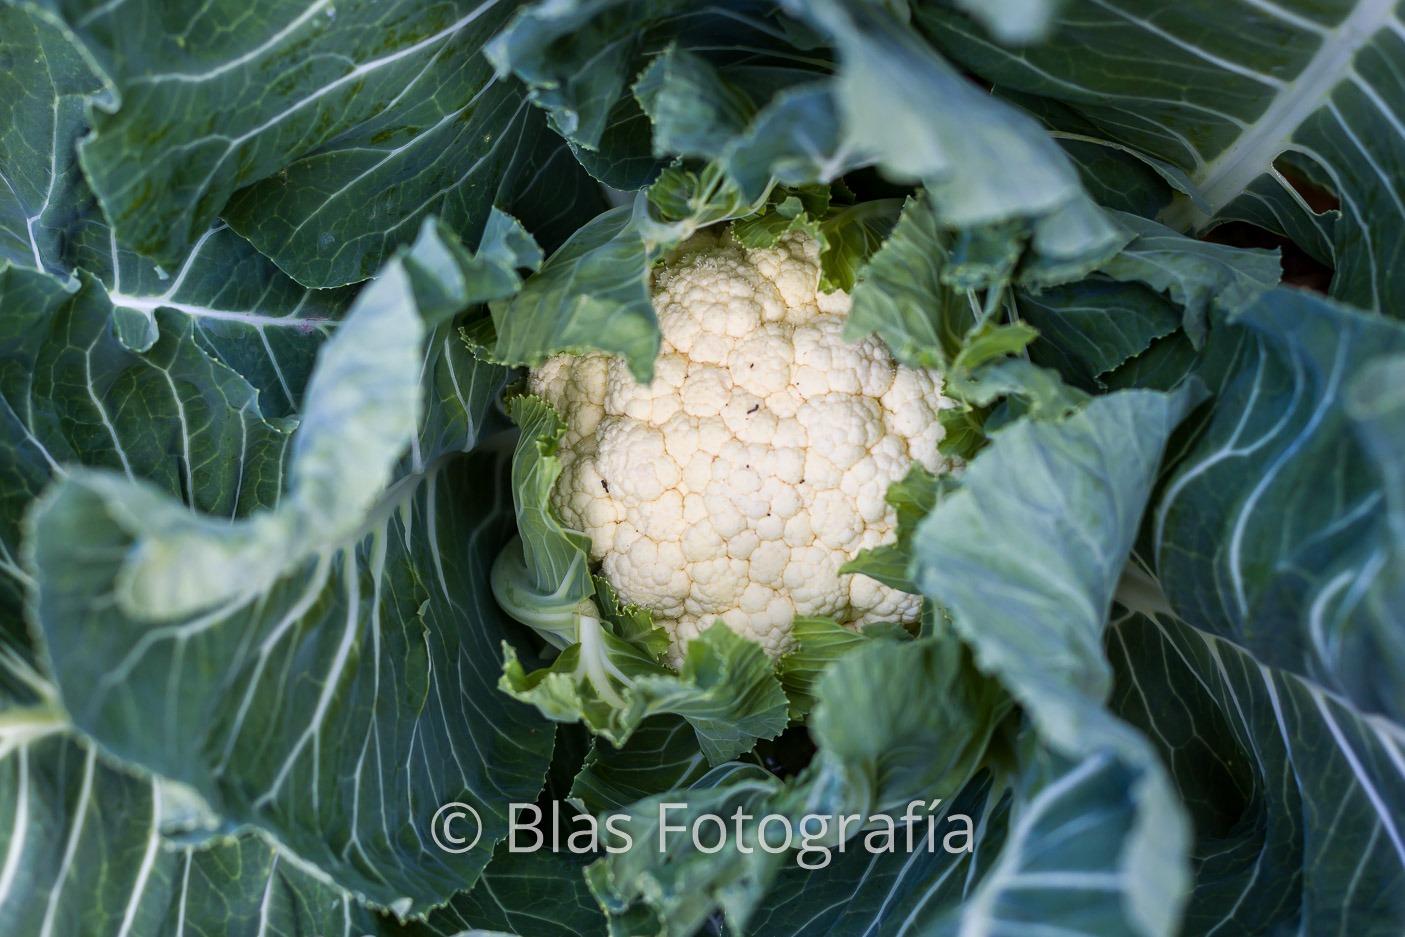 Brassica oleracea var. botrytis